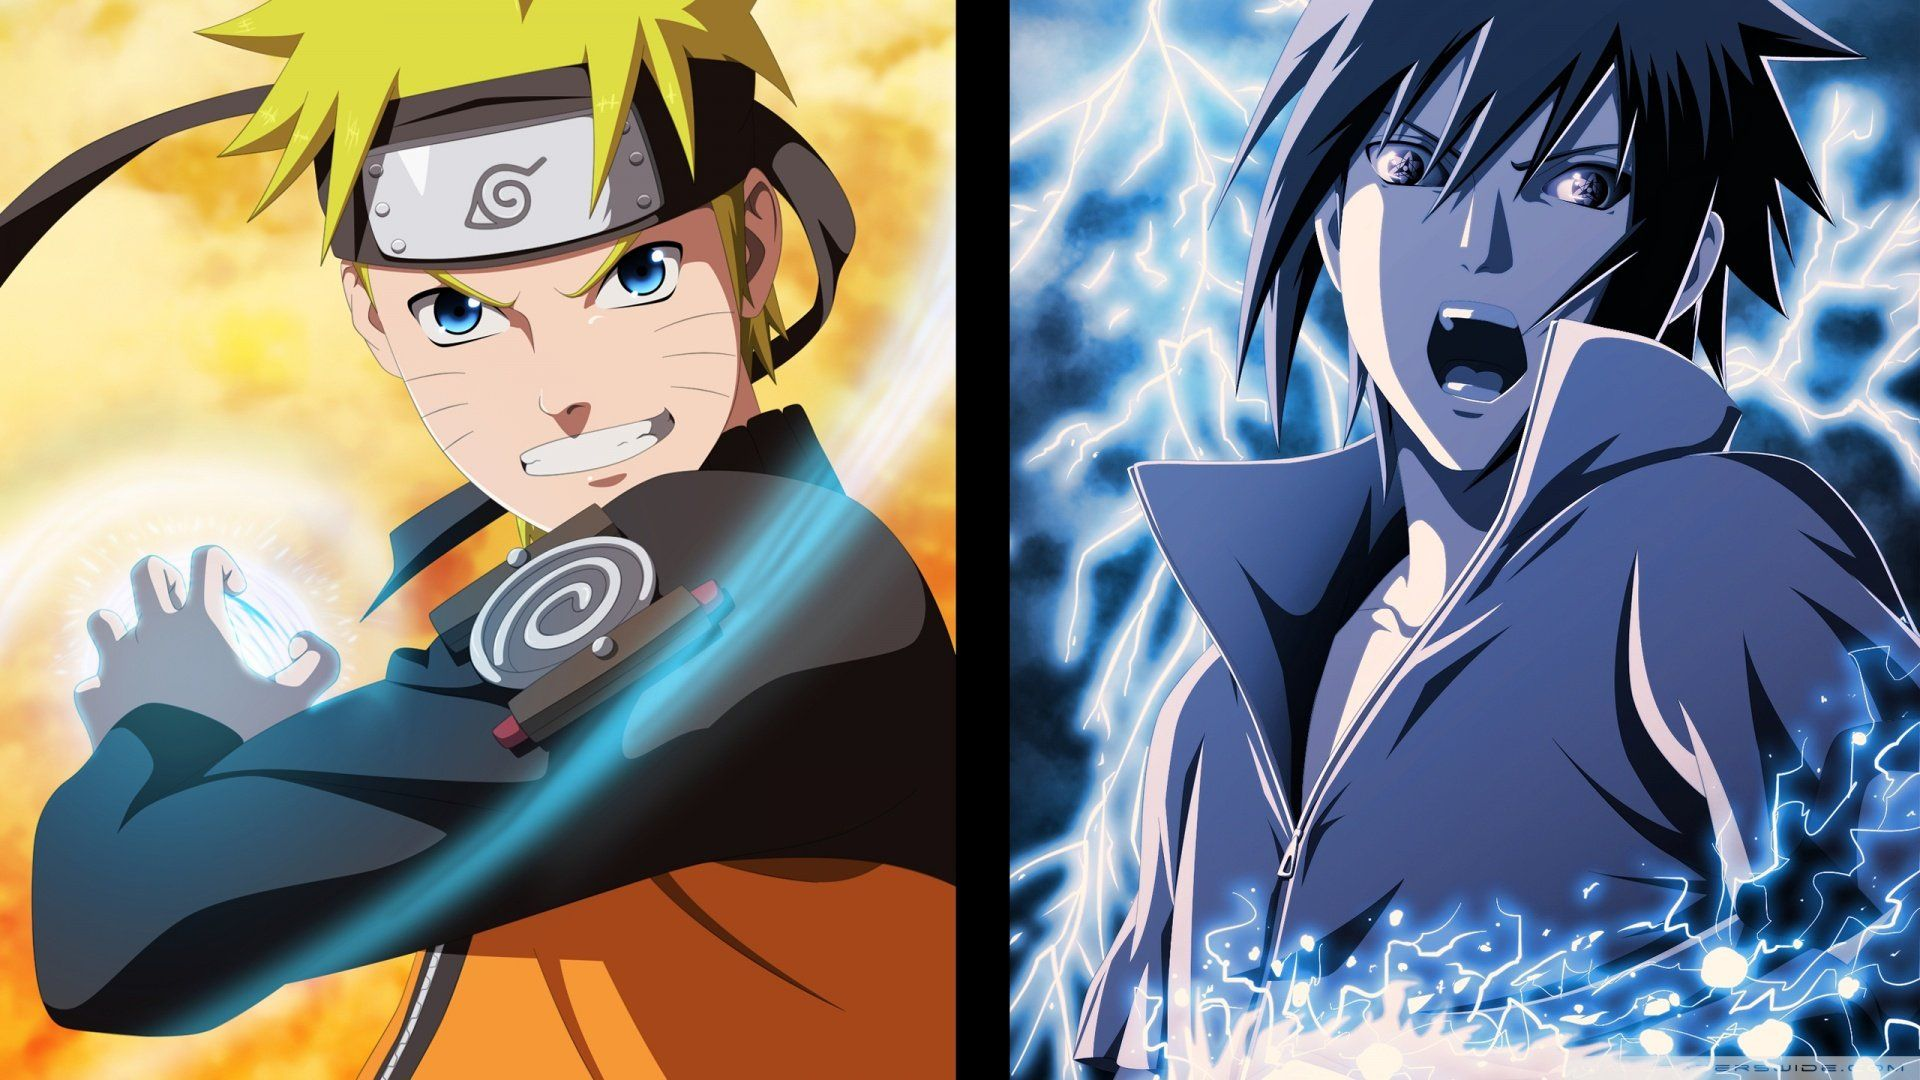 Naruto Vs Sasuke 4k Wallpaper Mobile ~ Click Wallpapers ...